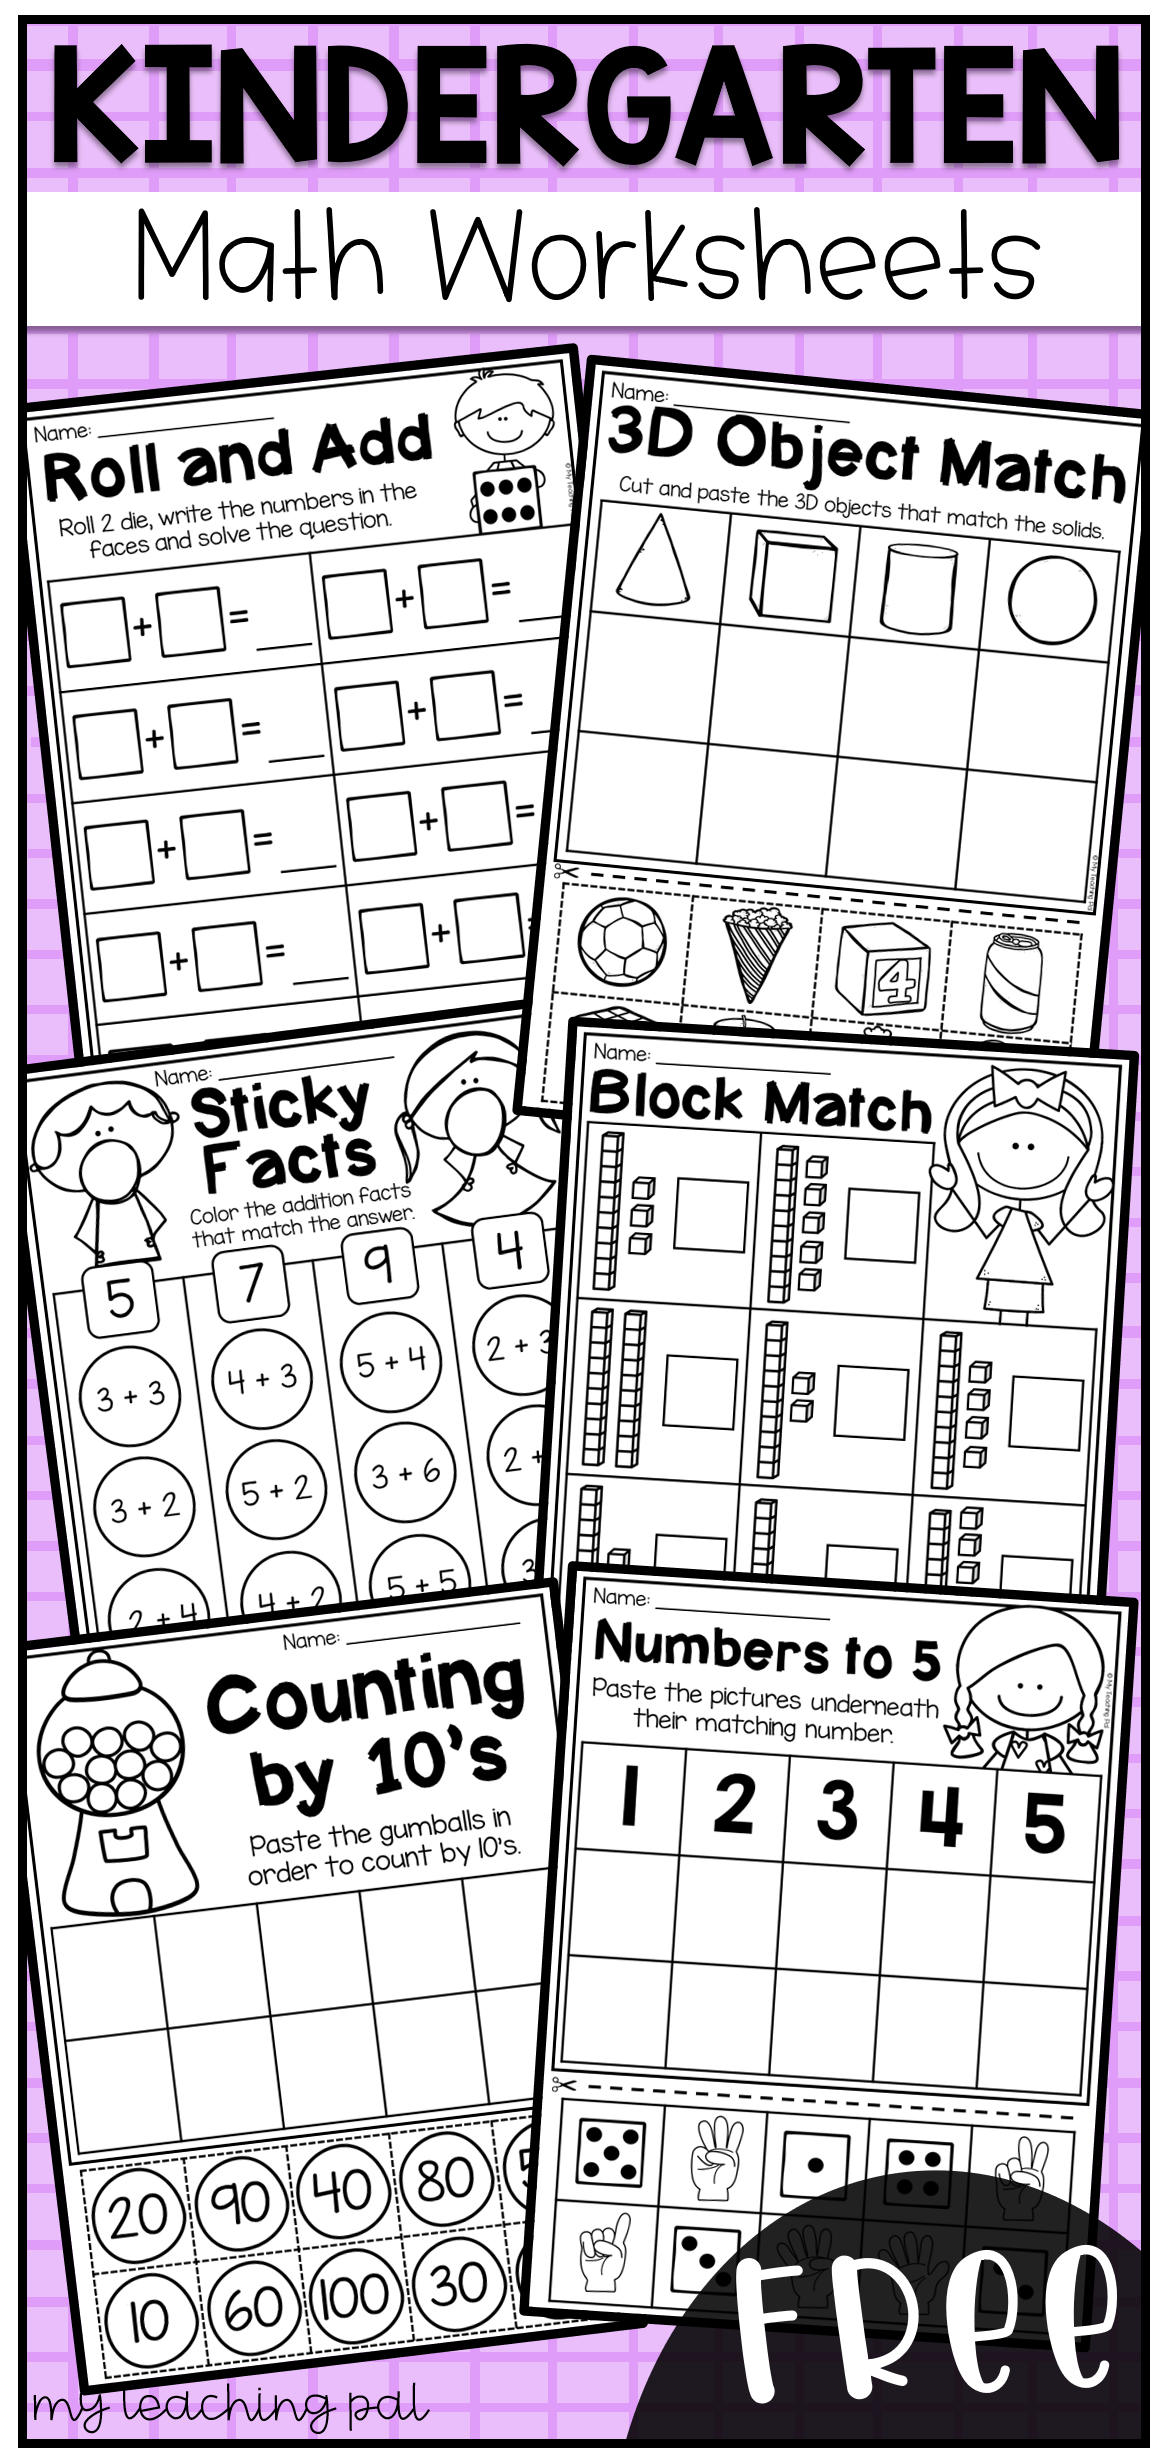 Free Kindergarten Math Worksheets